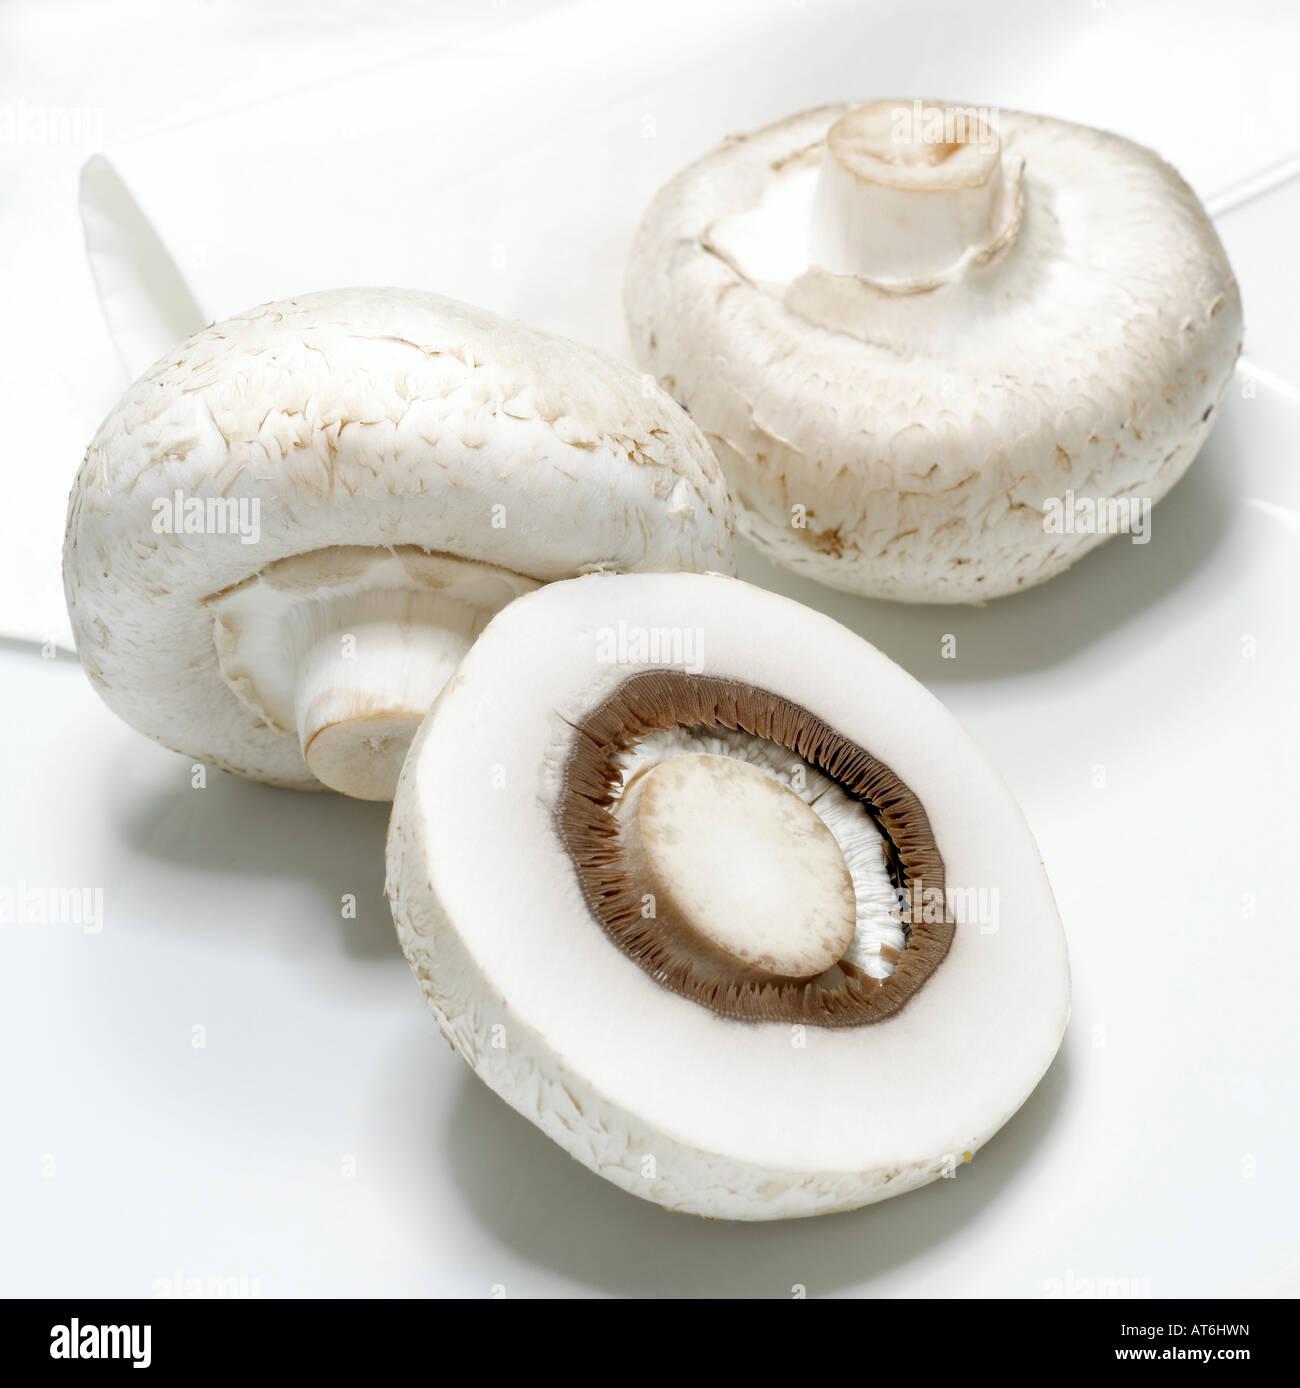 White mushrooms, close-up - Stock Image